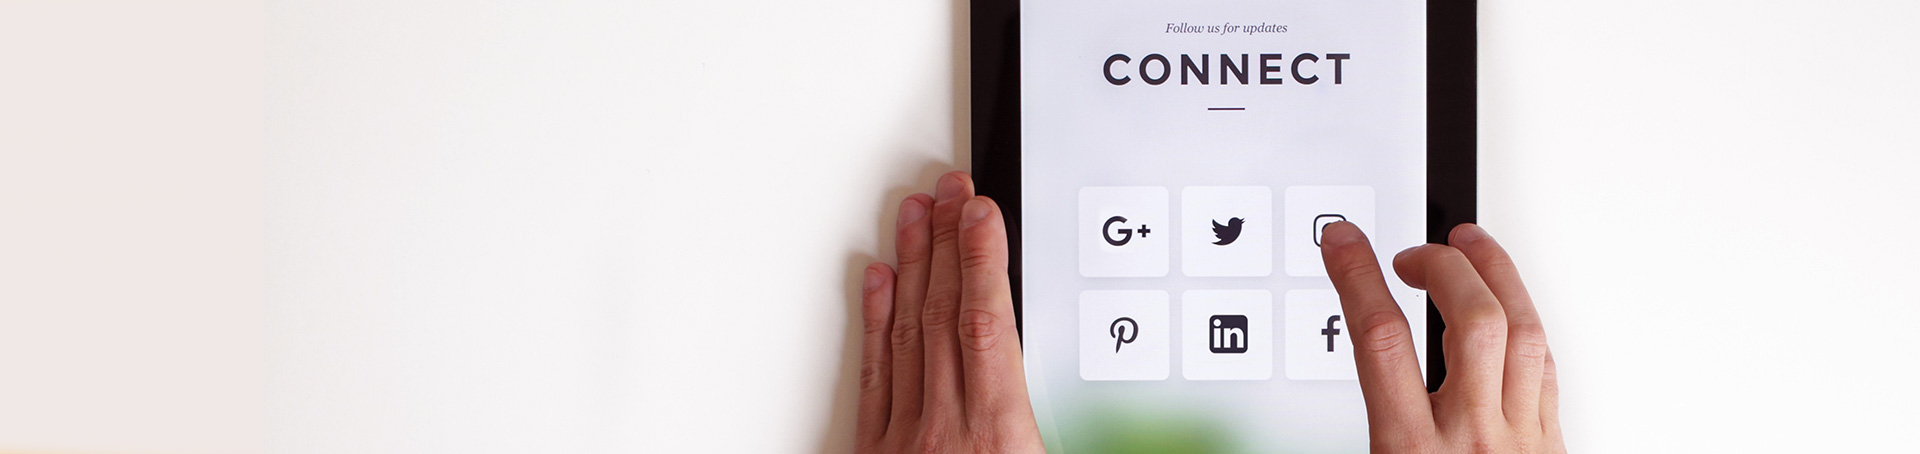 admaker agence digitale conseils strategie webmarketing e-reputation reseaux sociaux